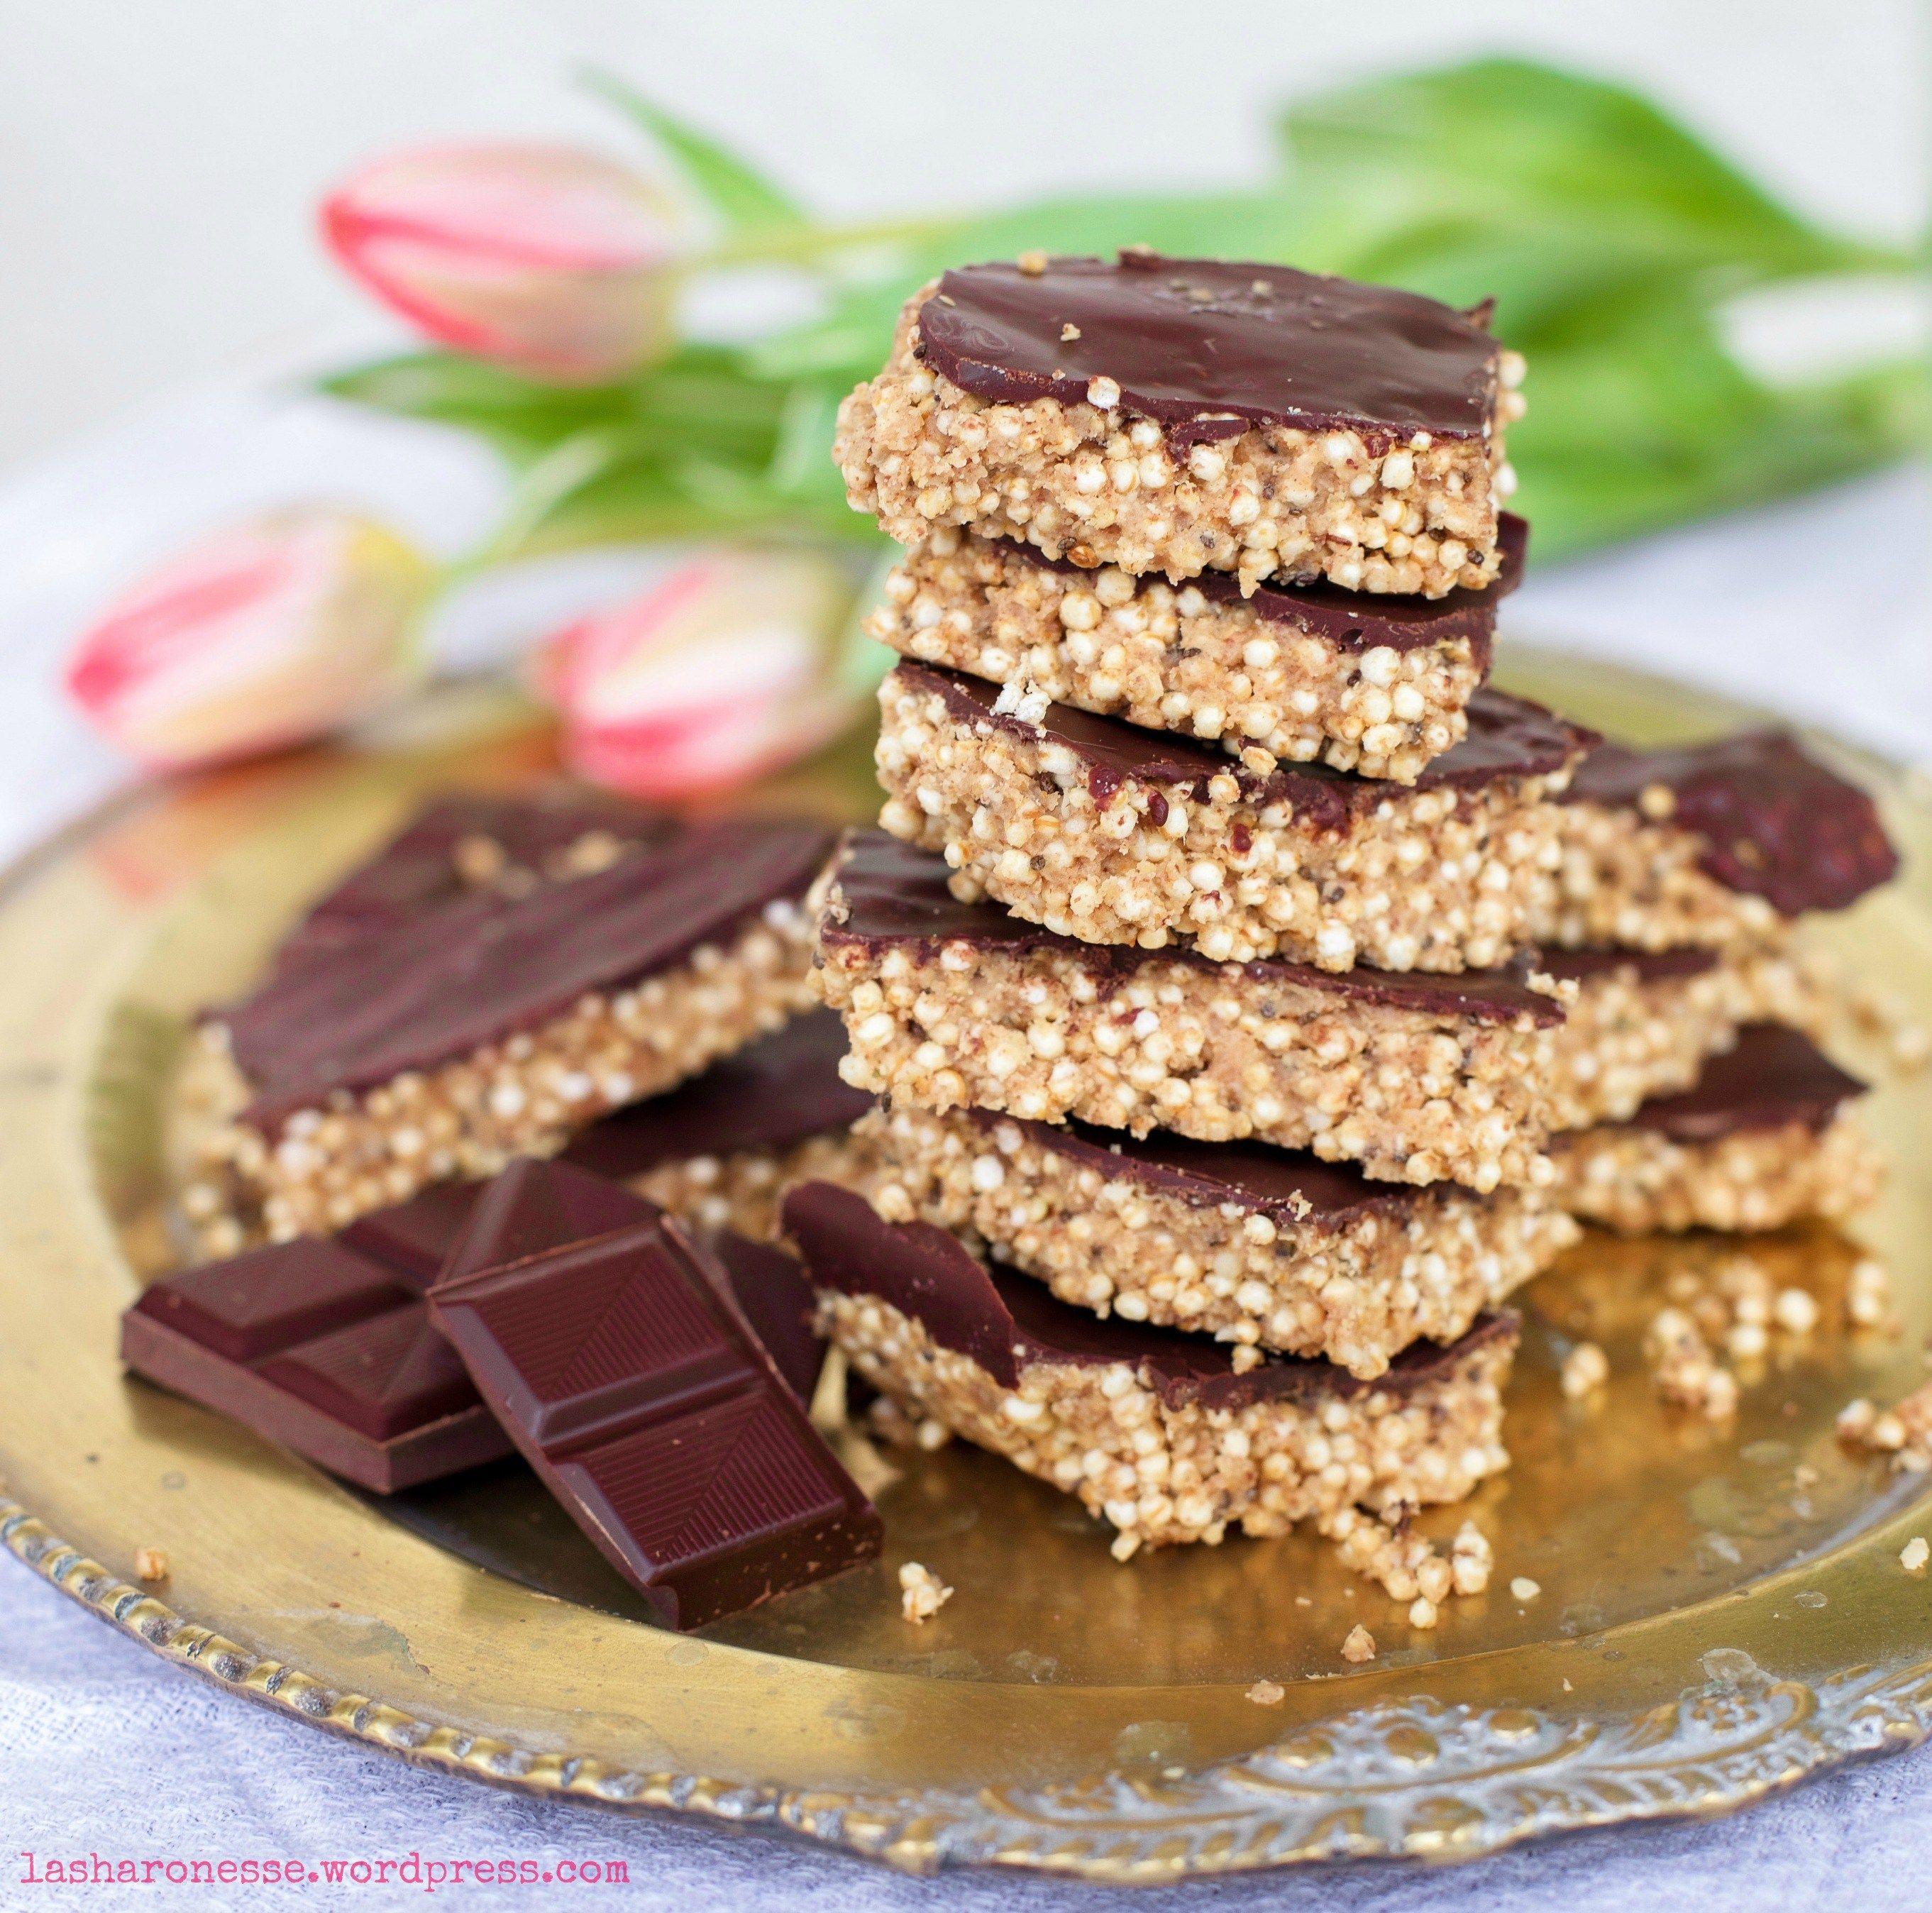 salzig s e erdnussbutter quinoa riegel mit schokolade. Black Bedroom Furniture Sets. Home Design Ideas